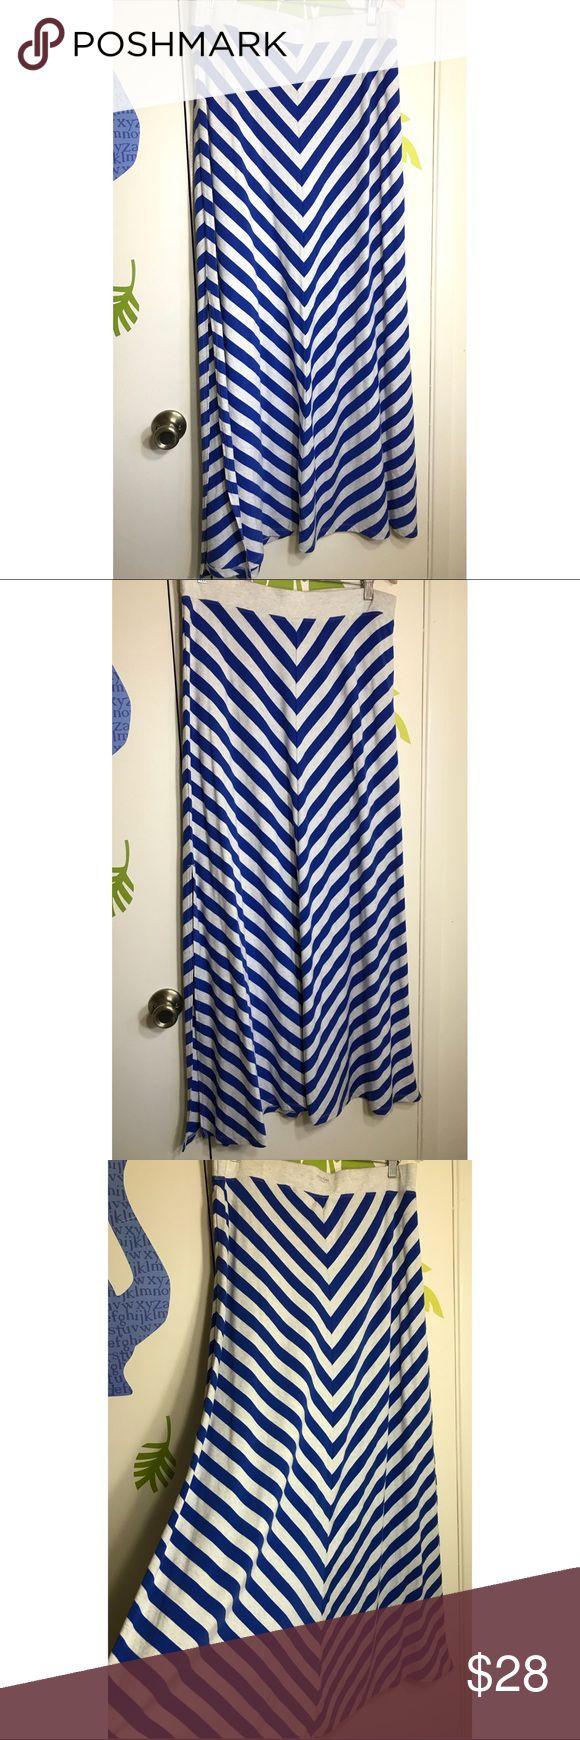 "Calvin Klein Maxi Skirt Size XL Blue Gray Chevron New with tags. Size XL. Measurements laying flat Waist 17"", length 41"" Calvin Klein Skirts Maxi"